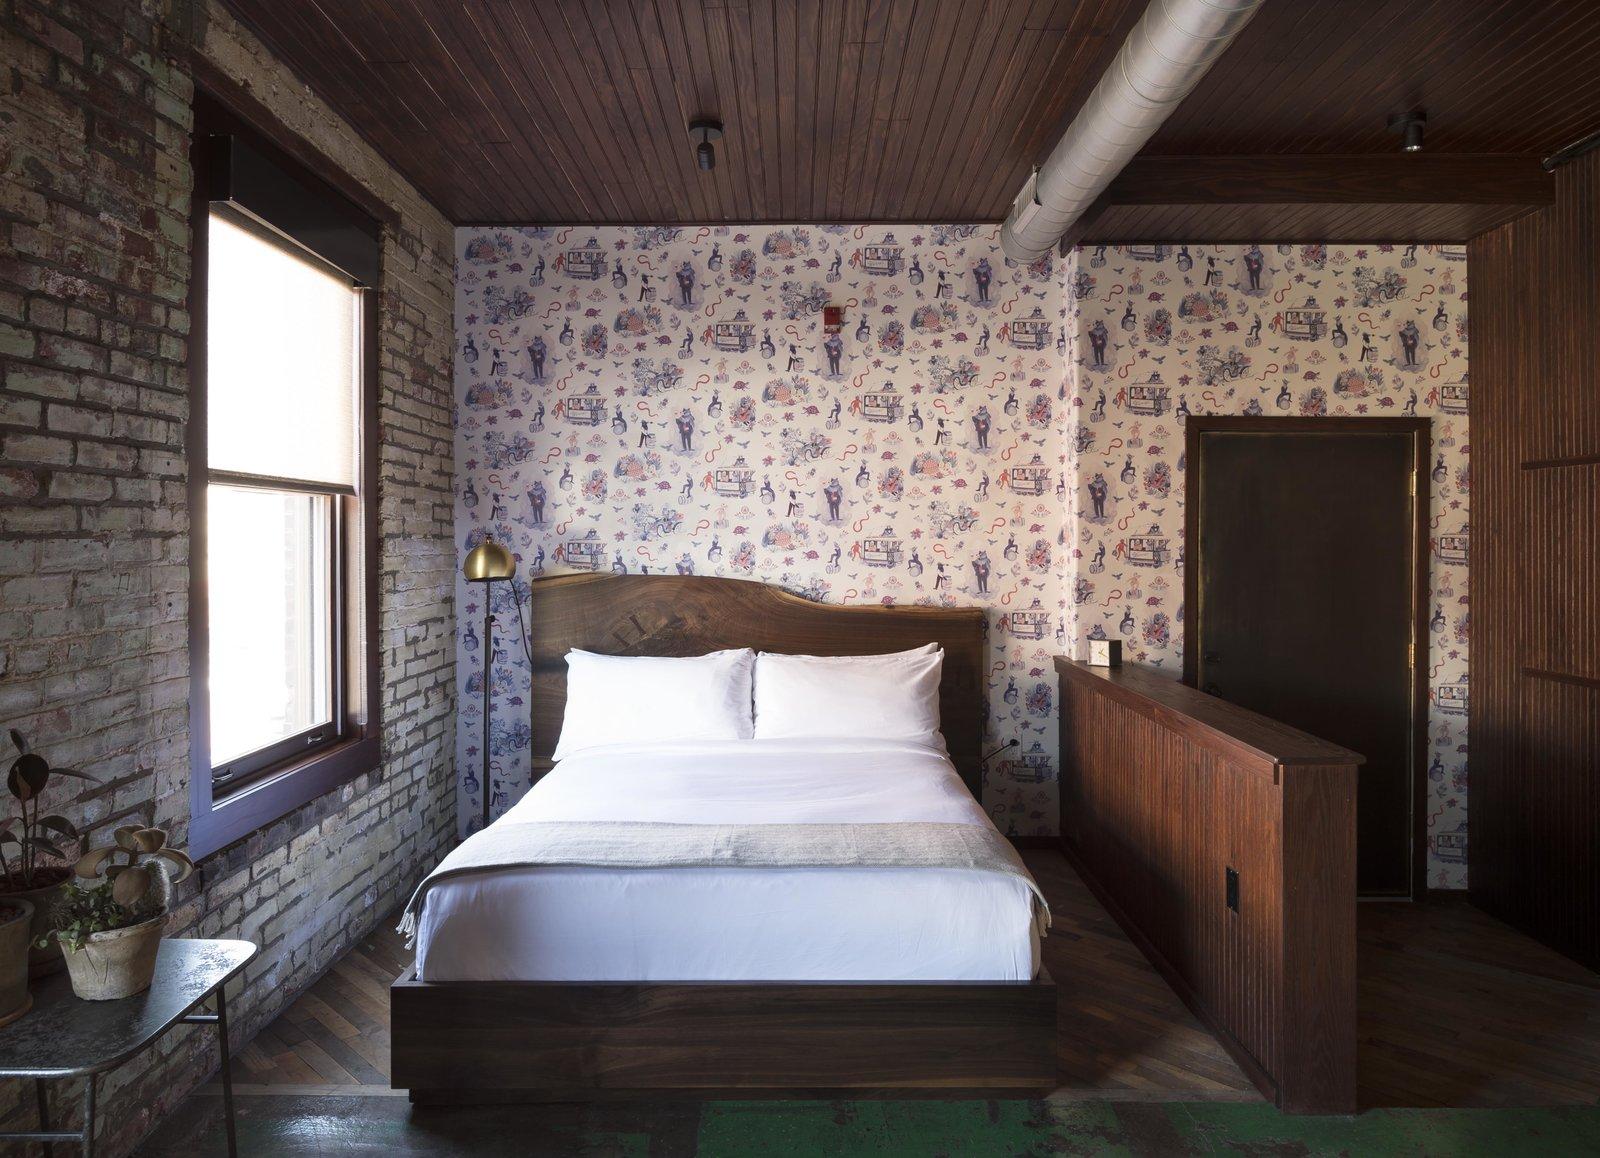 Tagged: Bedroom, Bed, Medium Hardwood Floor, Floor Lighting, and Lamps.  Mulherin's Hotel by Daniel Olsovsky